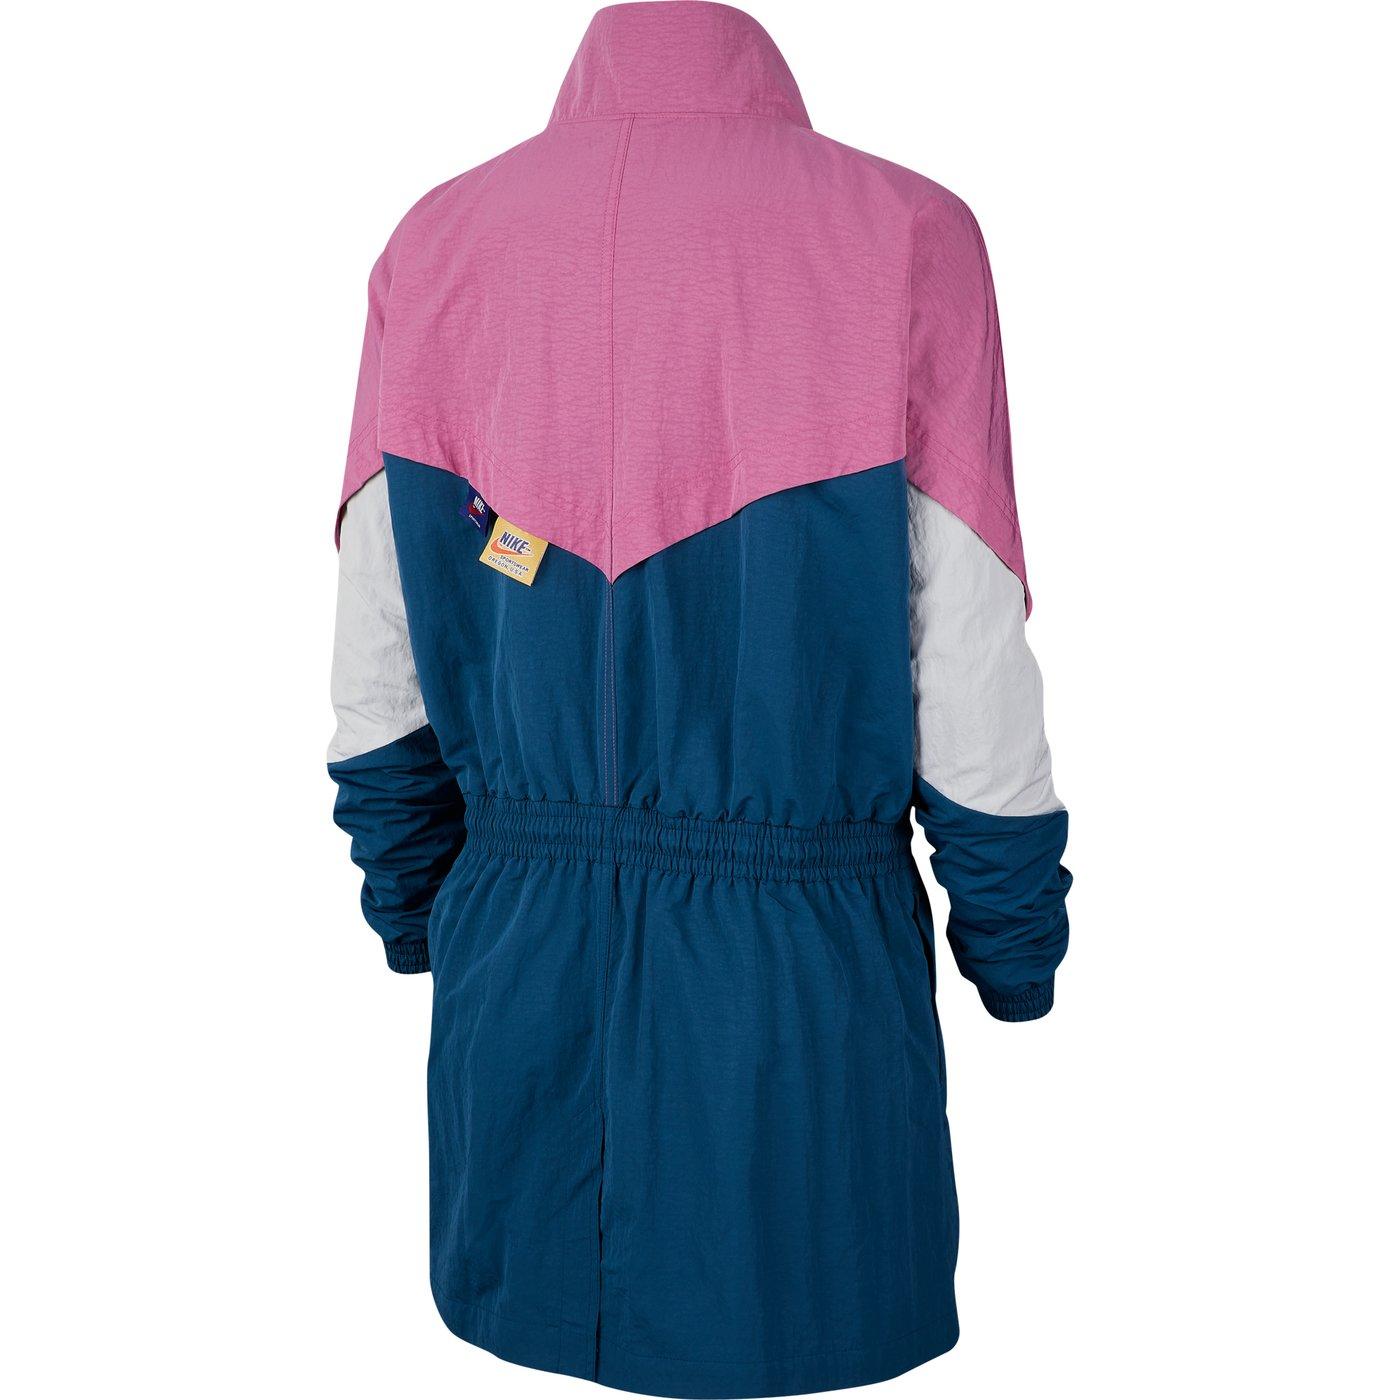 Nike Sportswear Kadın Lacivert-Pembe Ceket